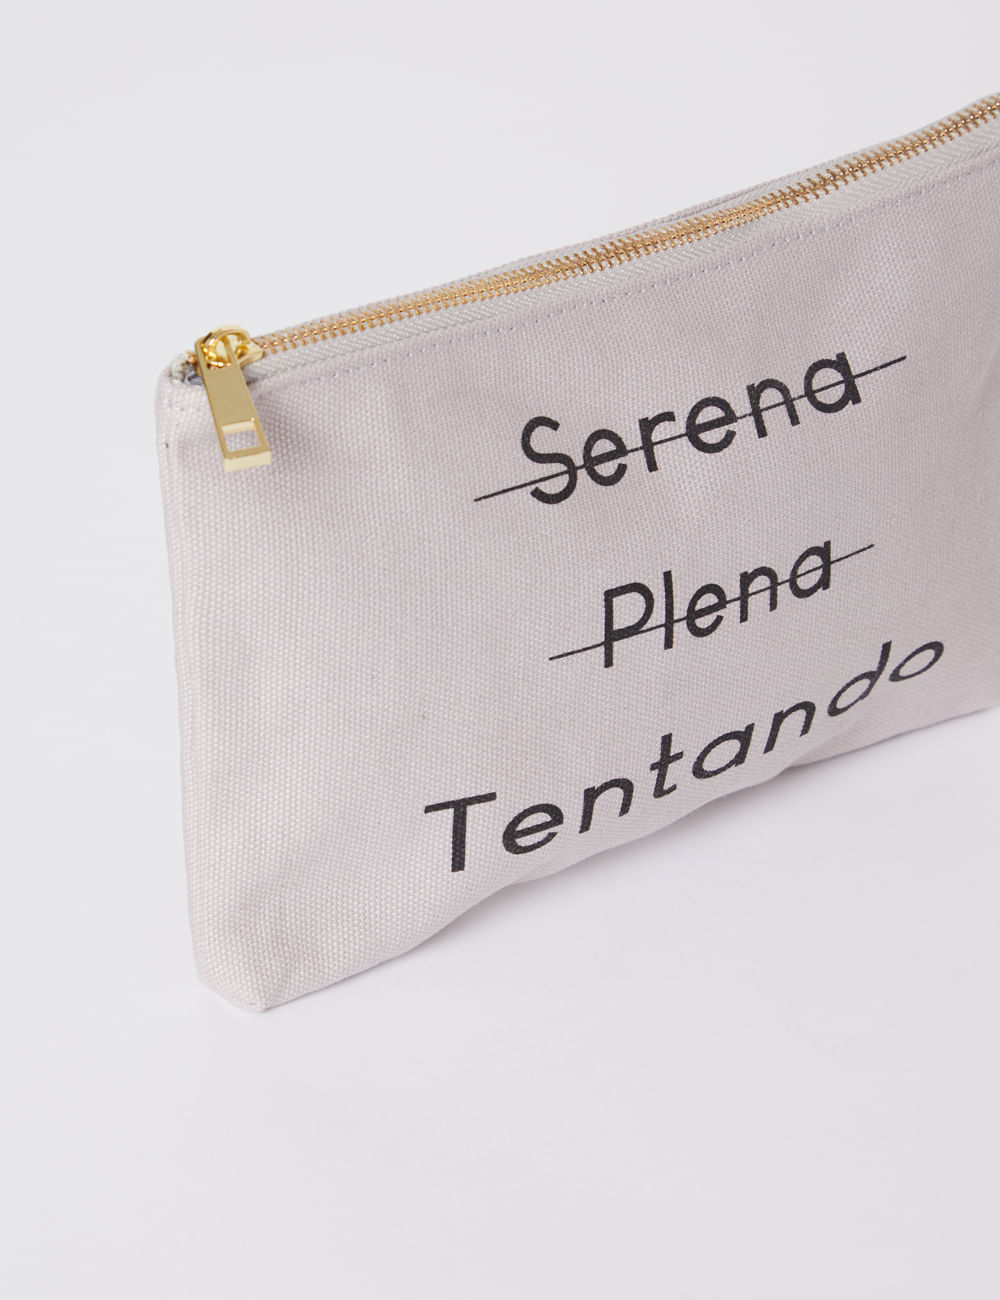 08050026_055_1-NECESSAIRE-SERENA